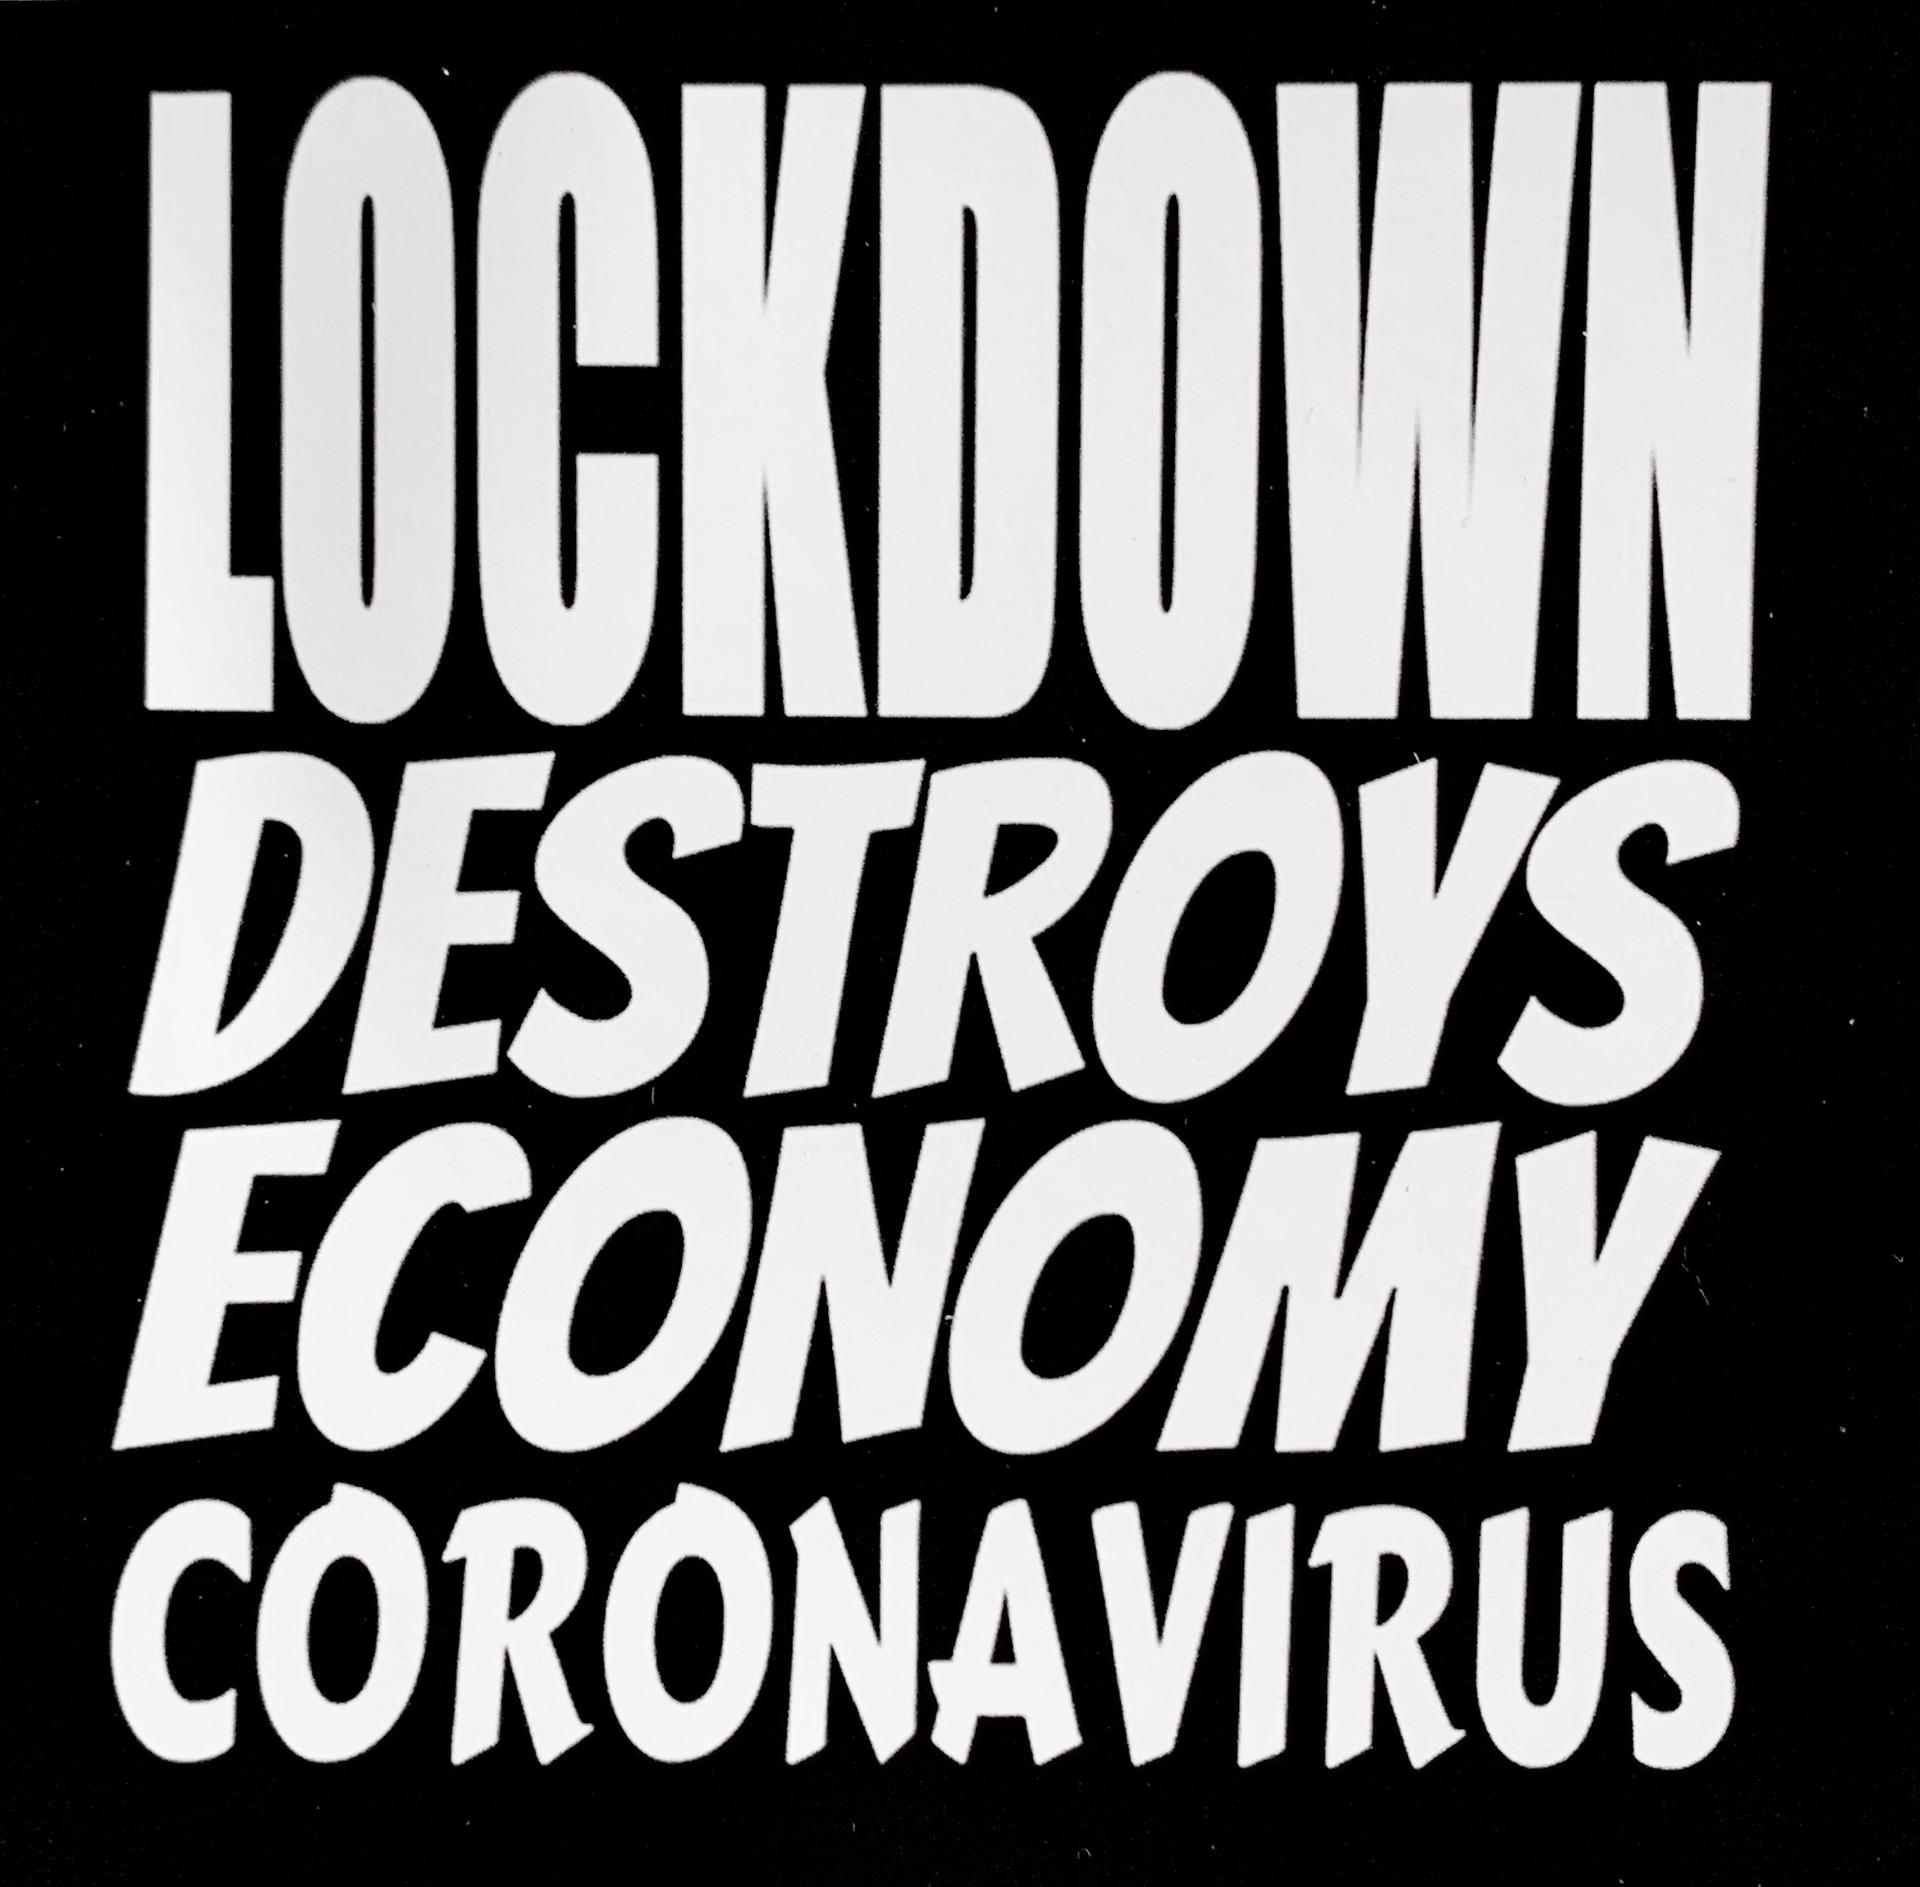 Lockdown Destroys Economy Coronavirus